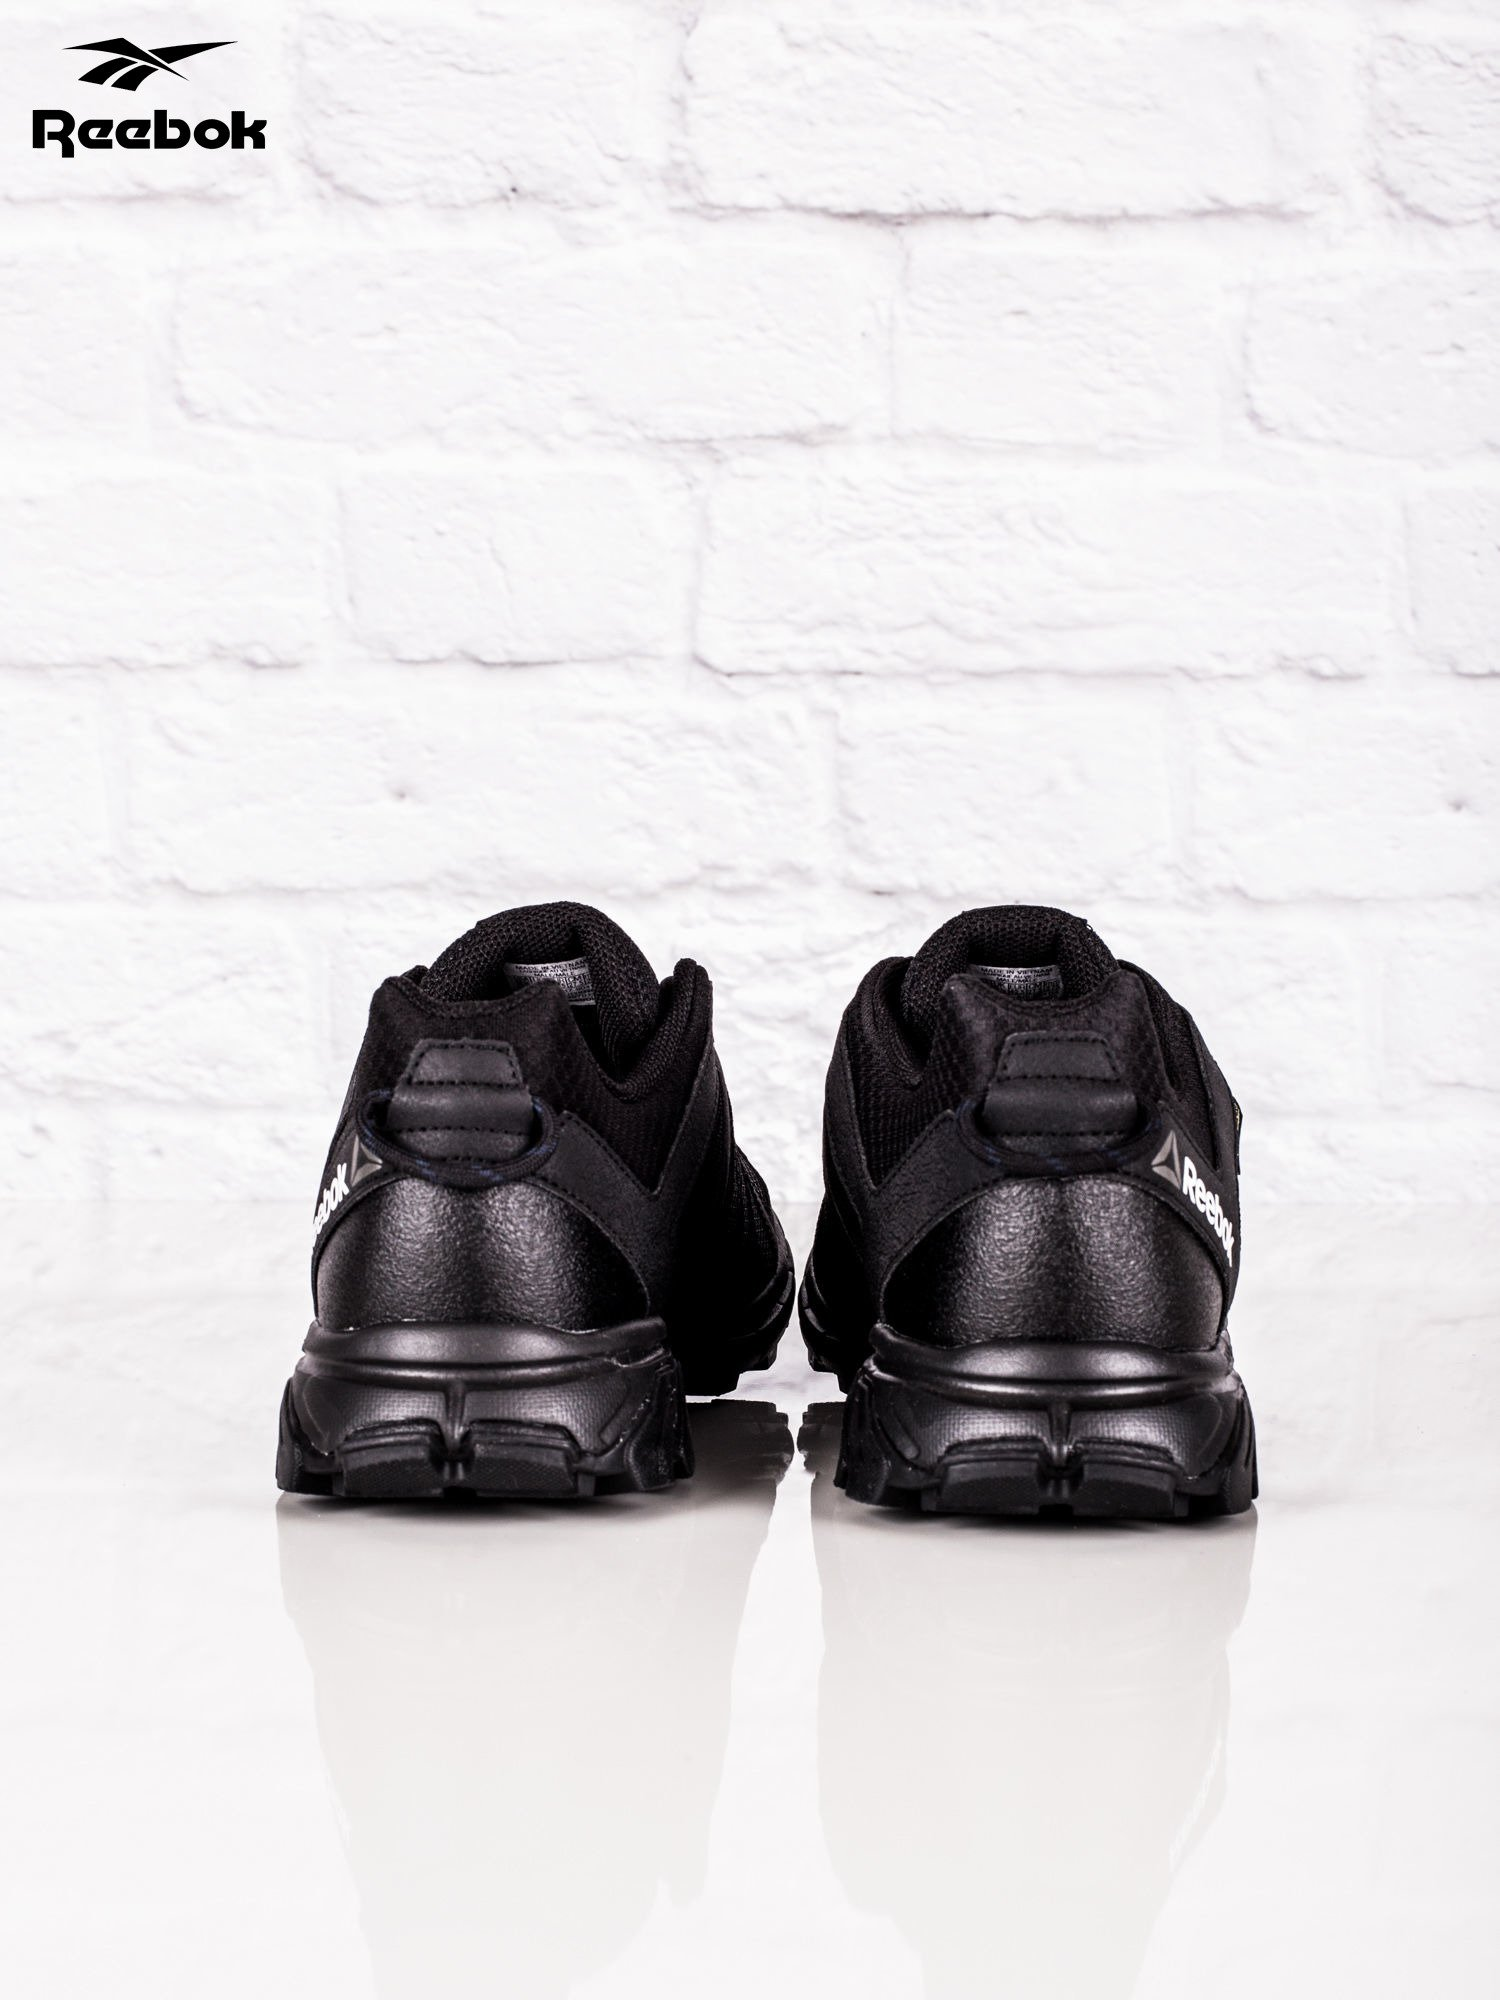 e6a6b11994e3a adidasy męskie czarne obuwie